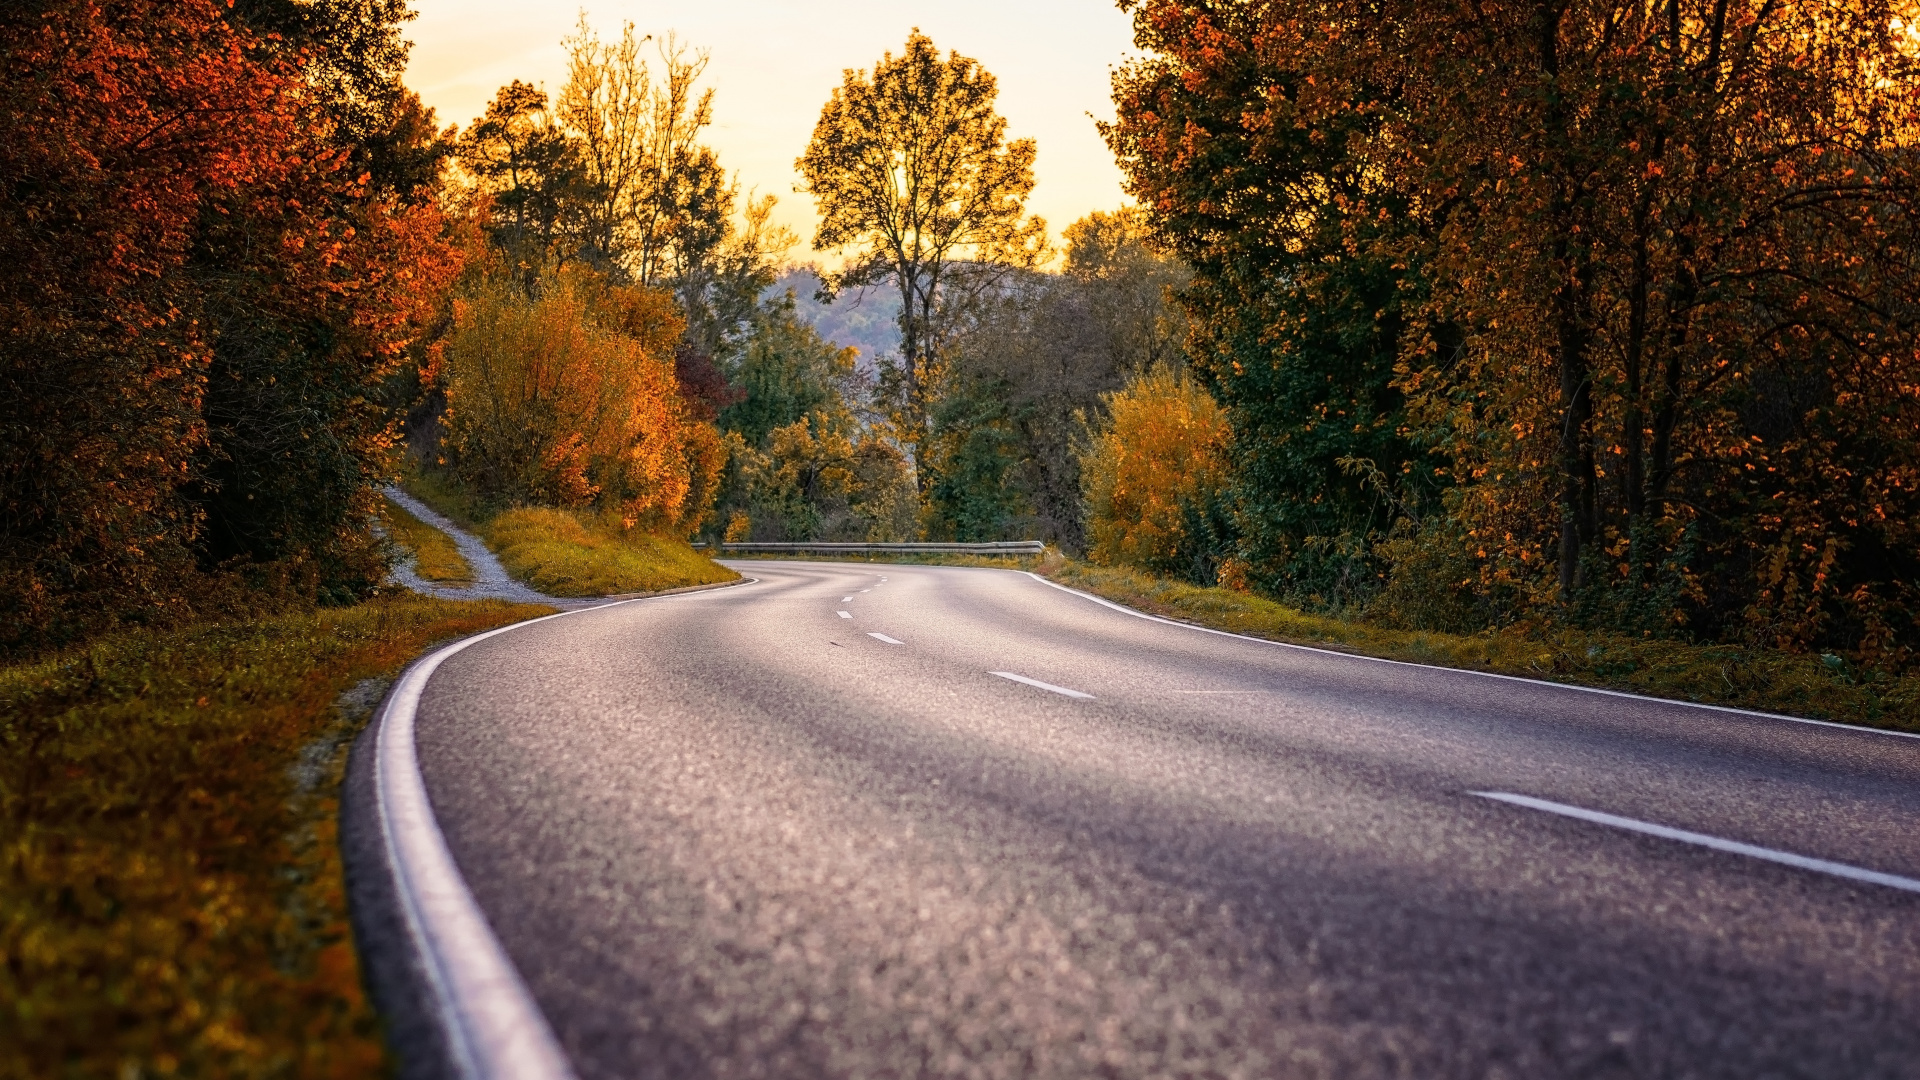 Road Highway Full Hd 1920x1080 Wallpaper Teahub Io